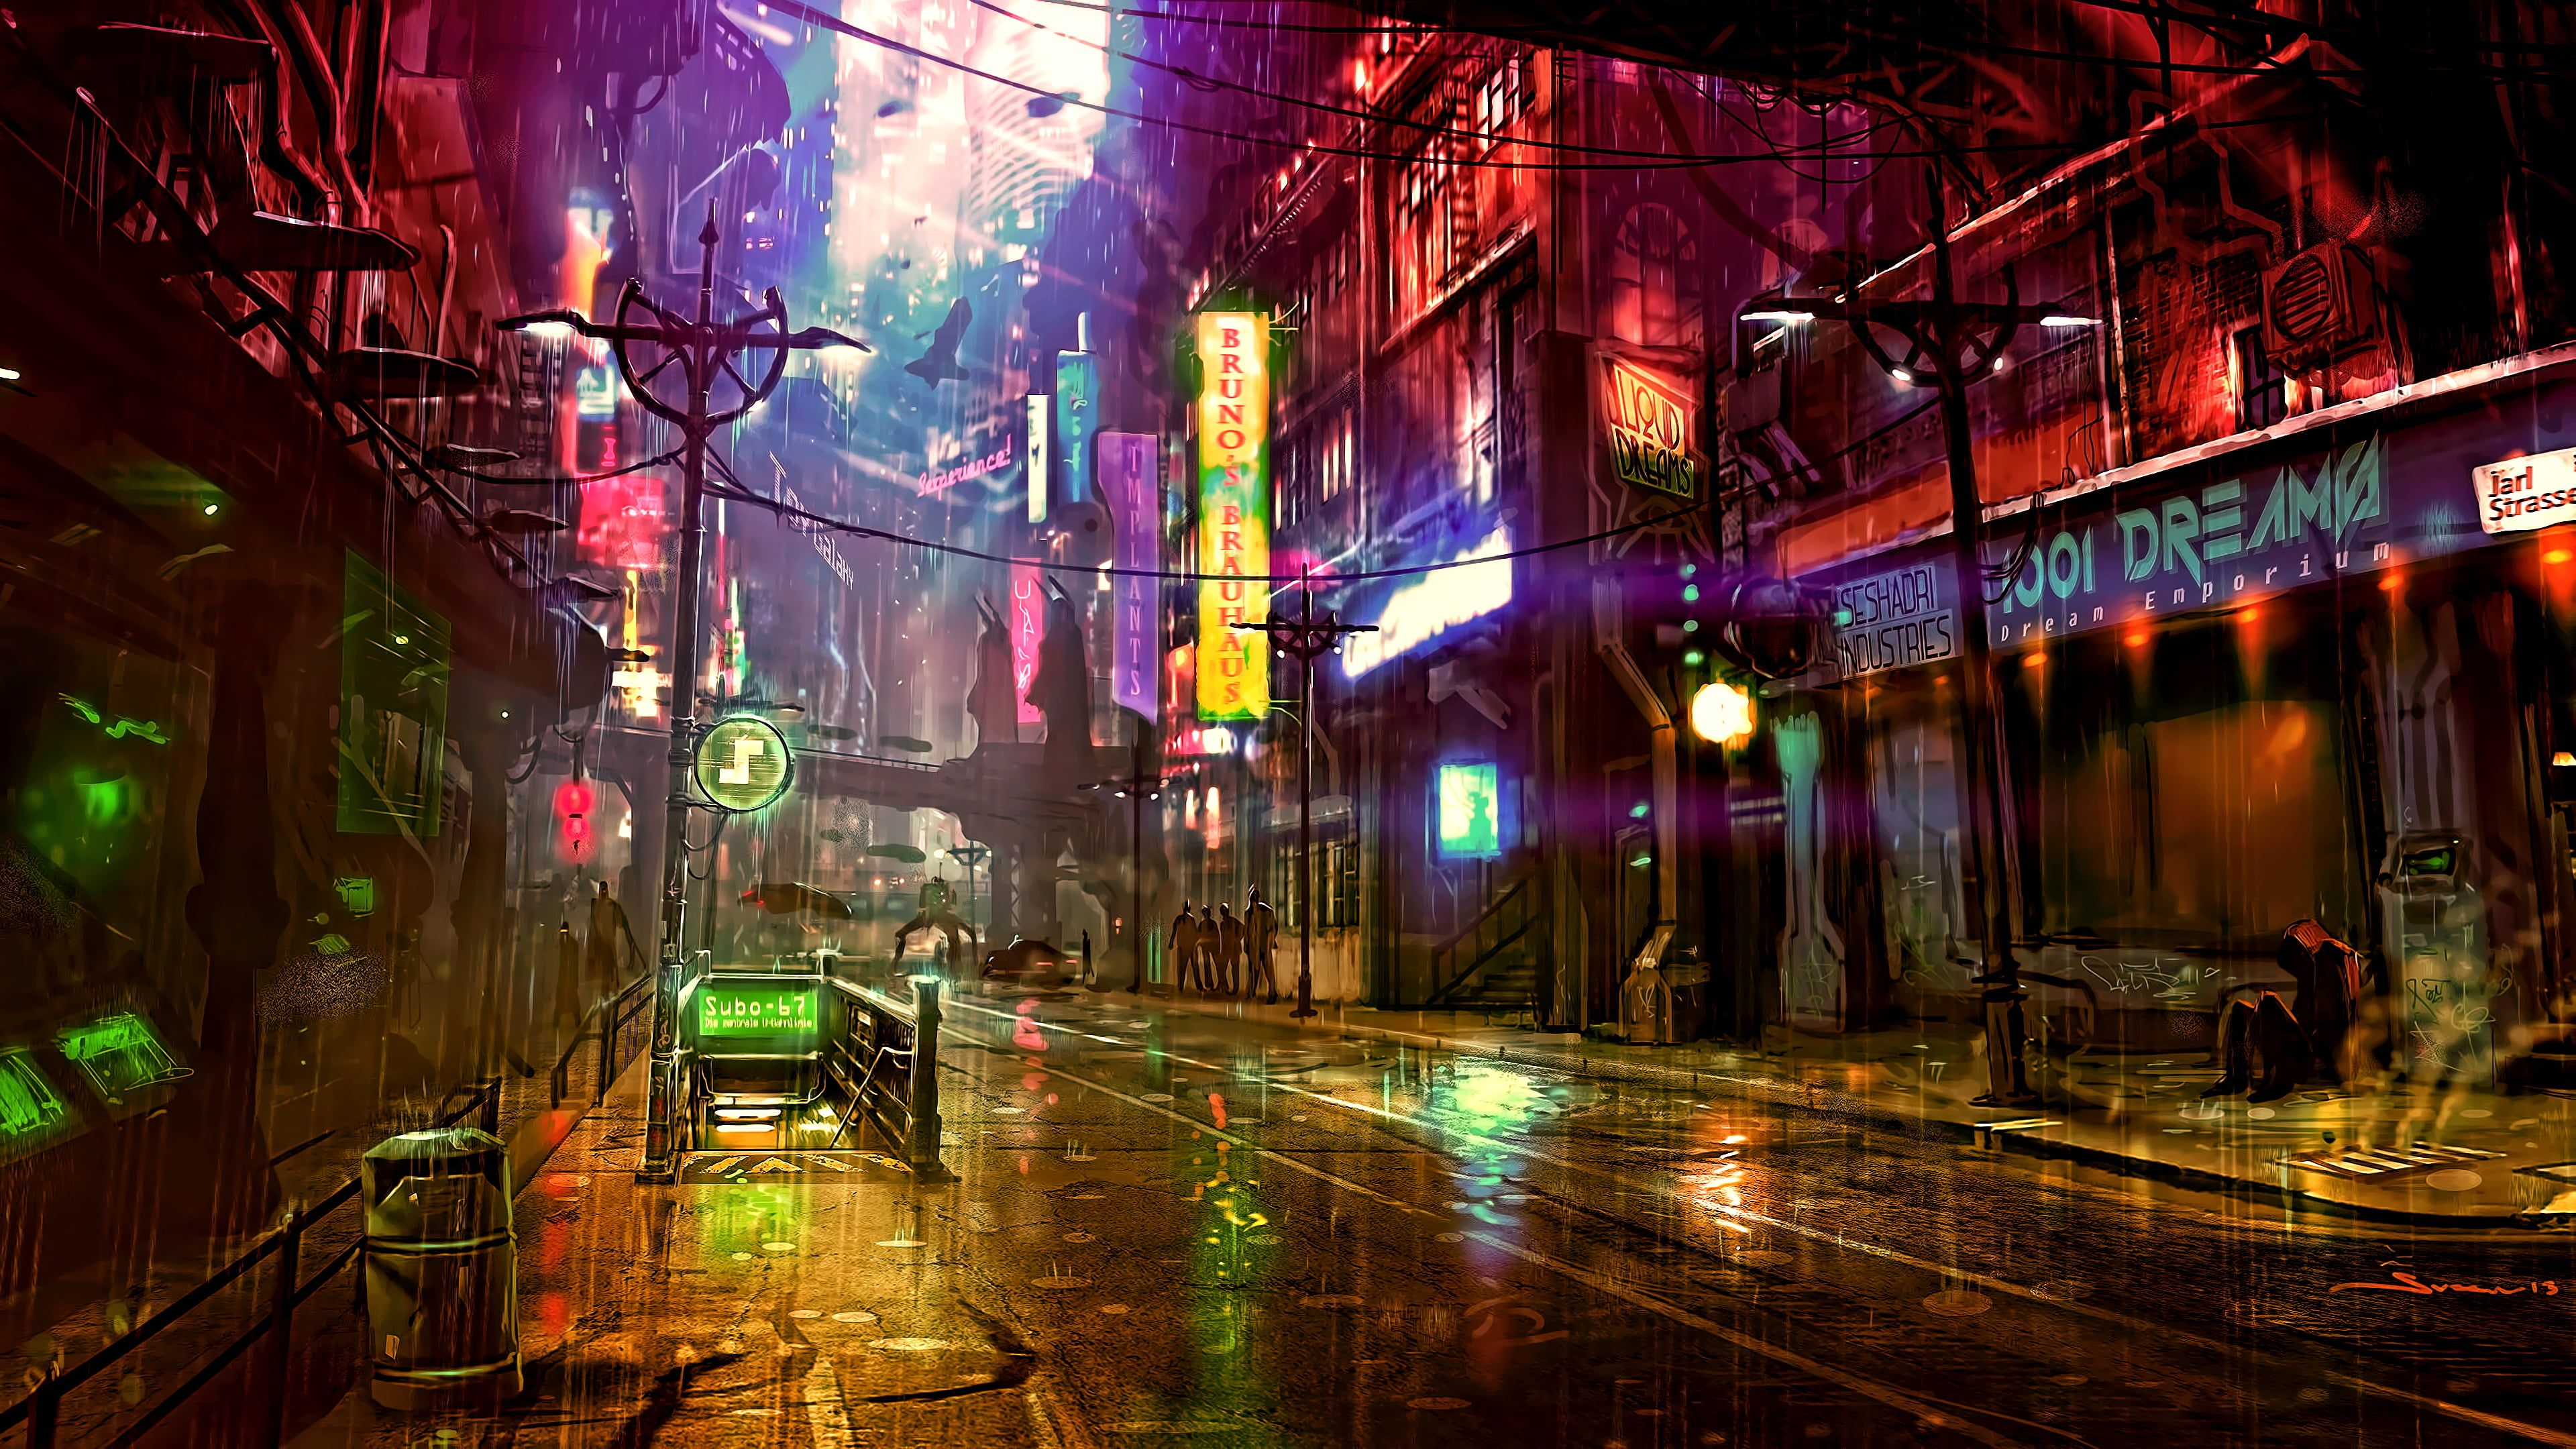 Digital Wallpaper Of City Street City View During Nighttime Night Artwork Futuristic City Cyberpunk Cyber Futuristic City City Wallpaper Digital Wallpaper 4k wallpaper city street